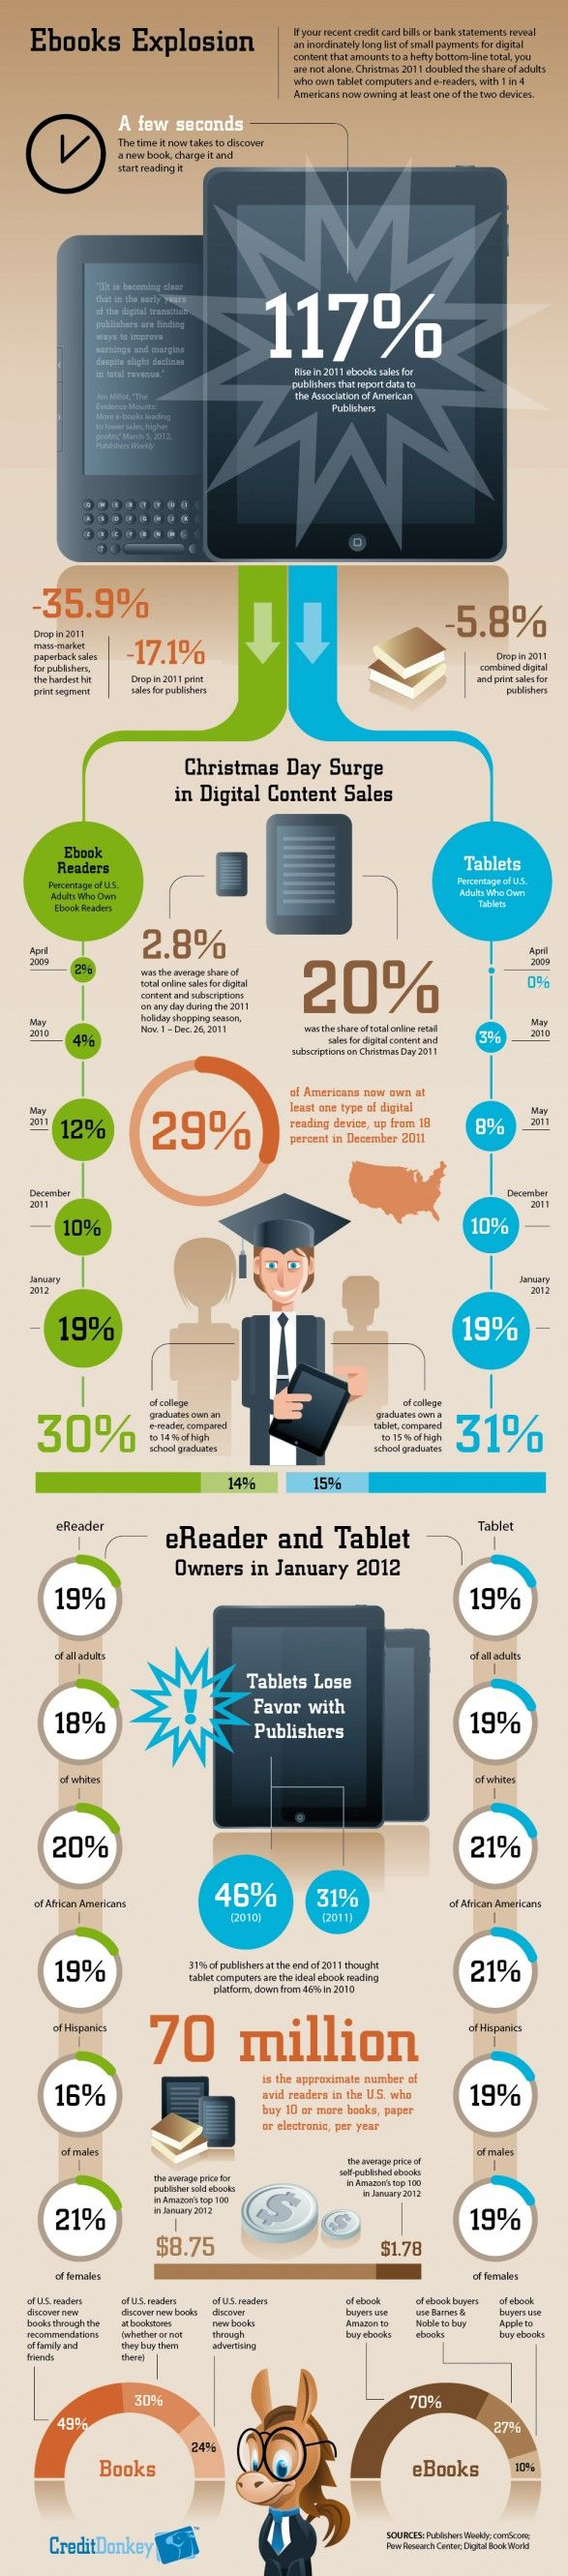 Ebook explosion infographic